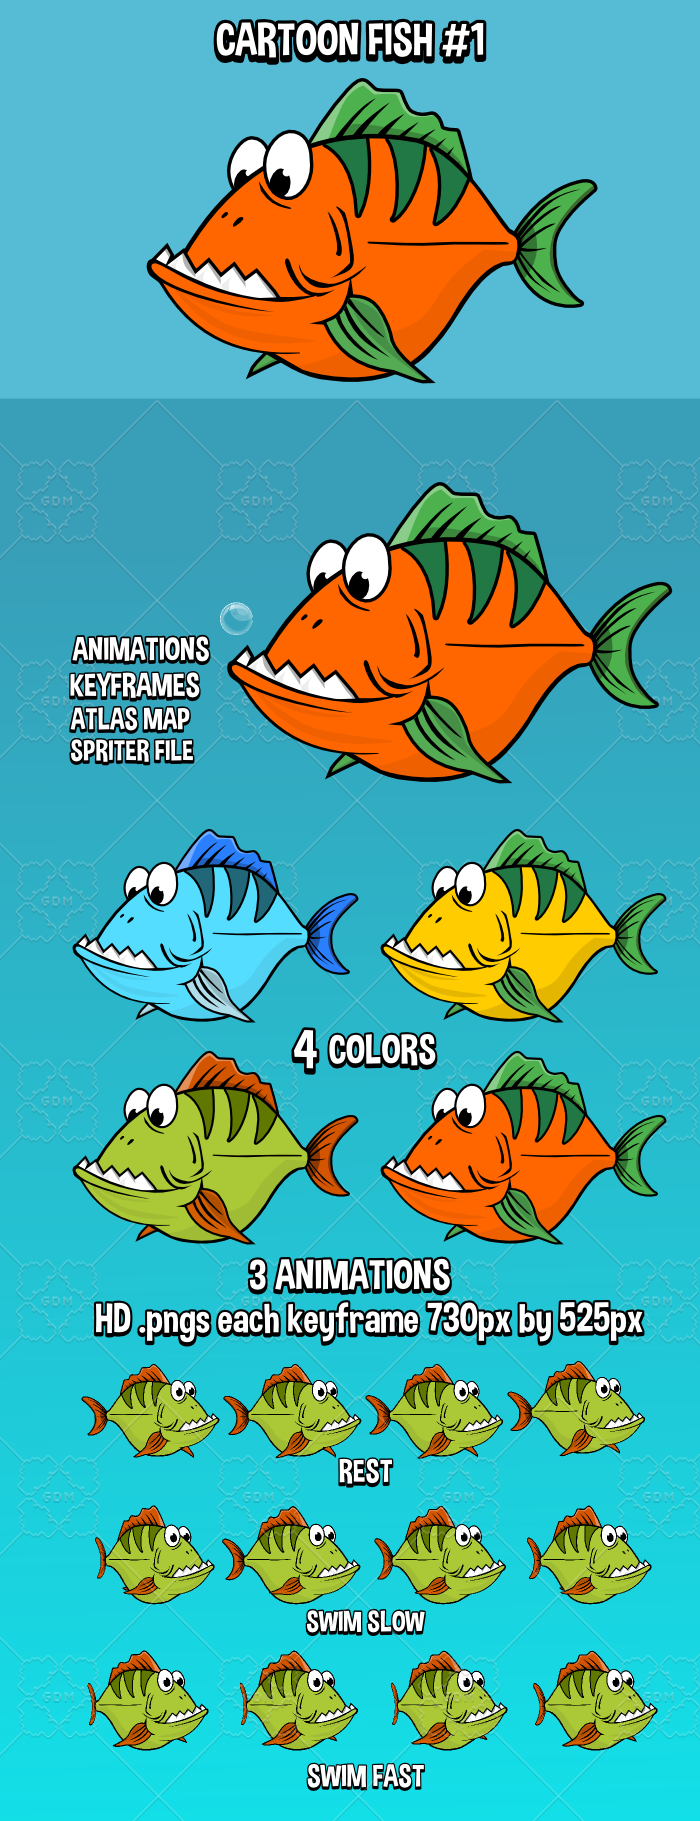 Cartoon fish 1